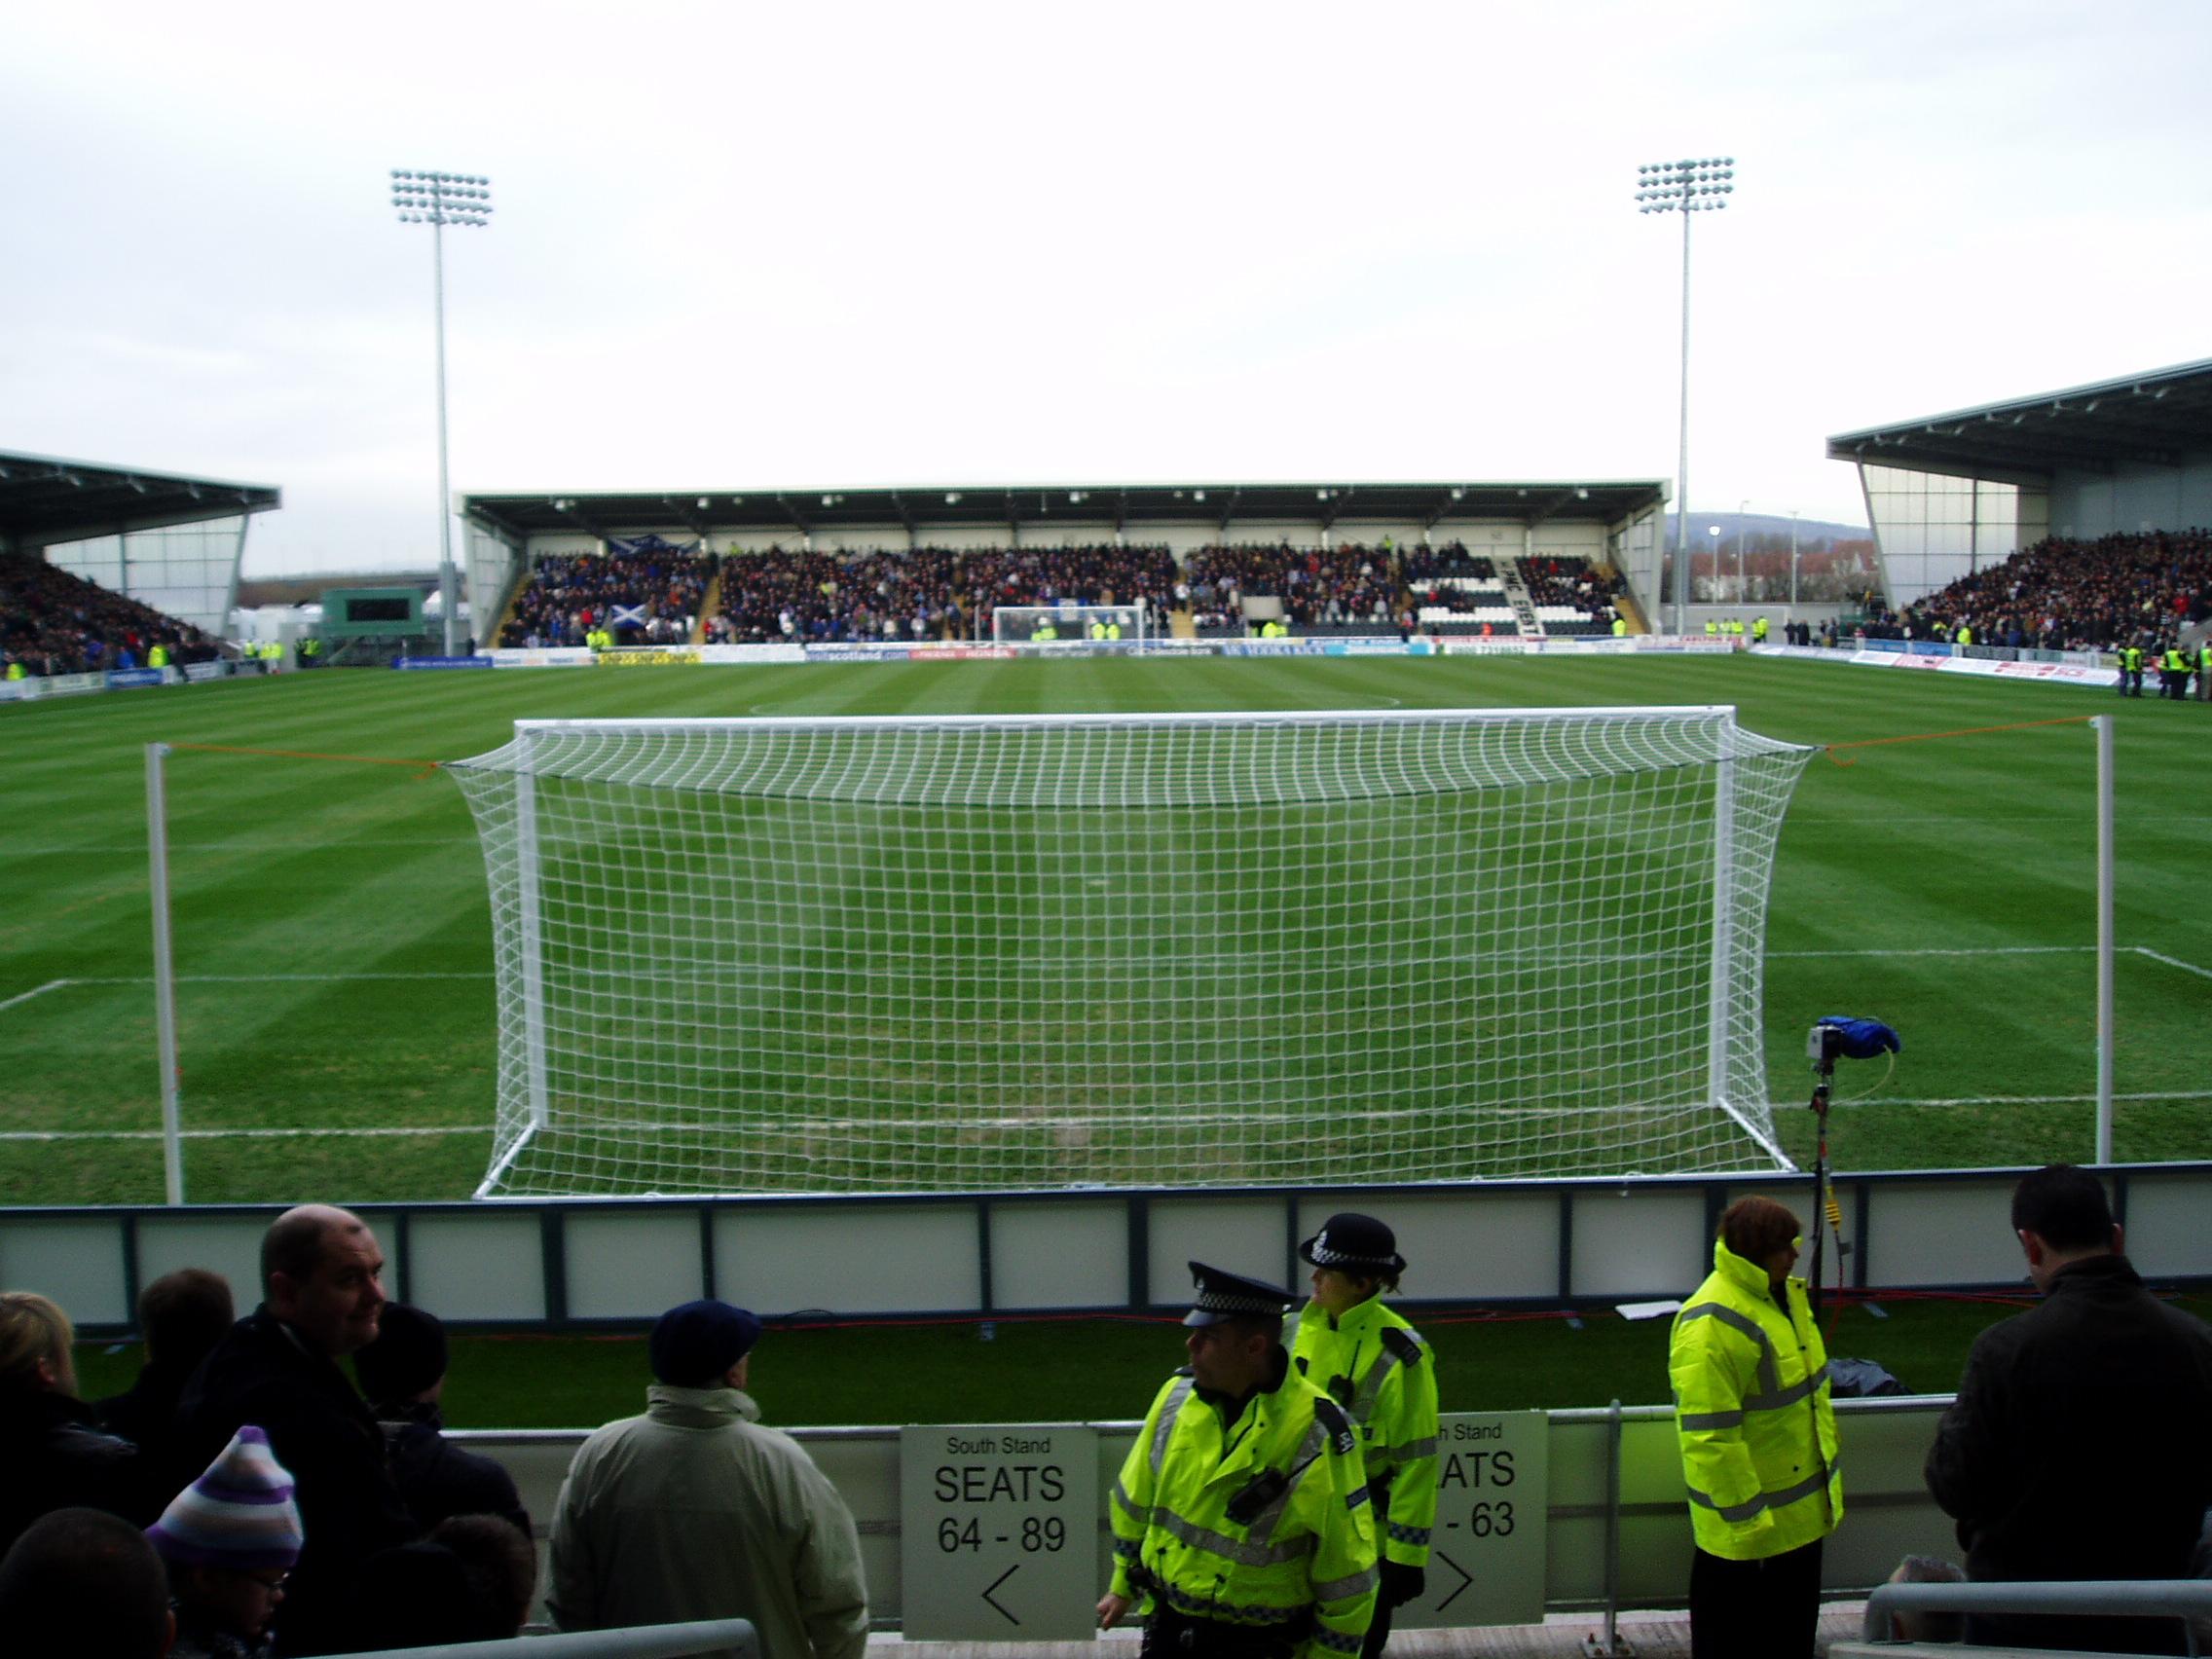 St Mirren Park 31 January 2009